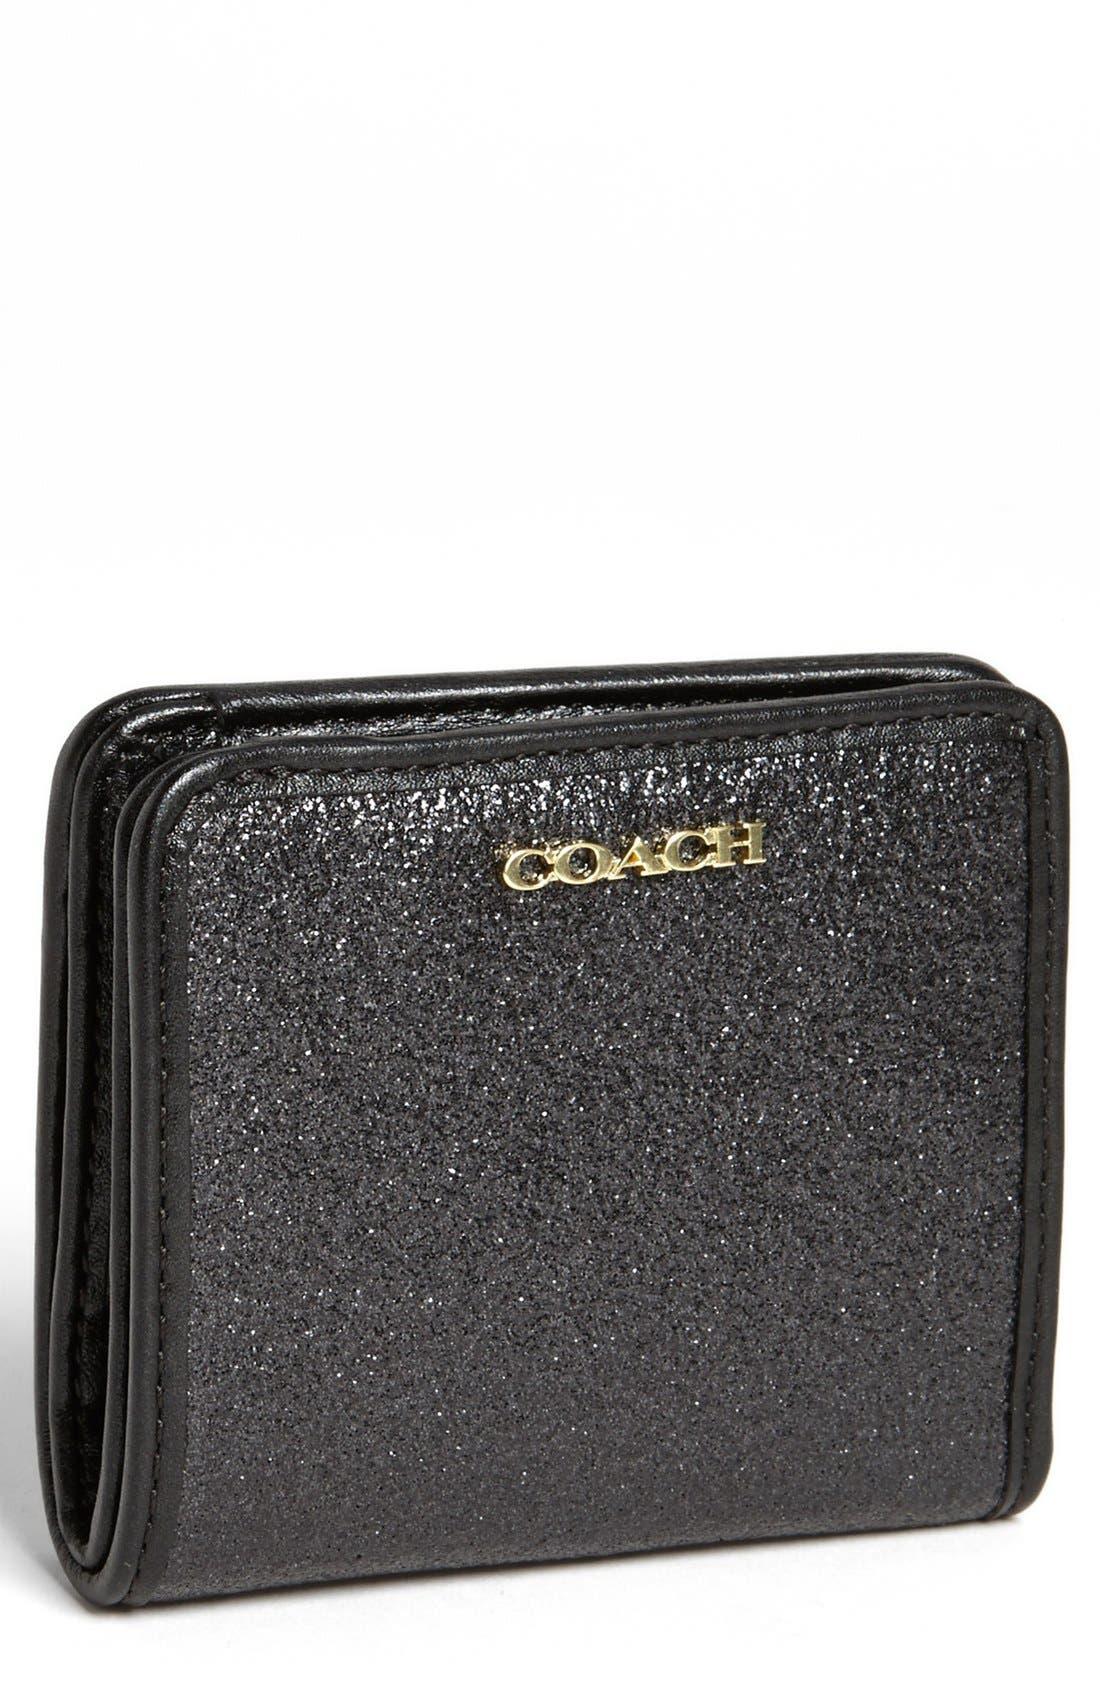 Alternate Image 1 Selected - COACH 'Glitter' Bifold Wallet